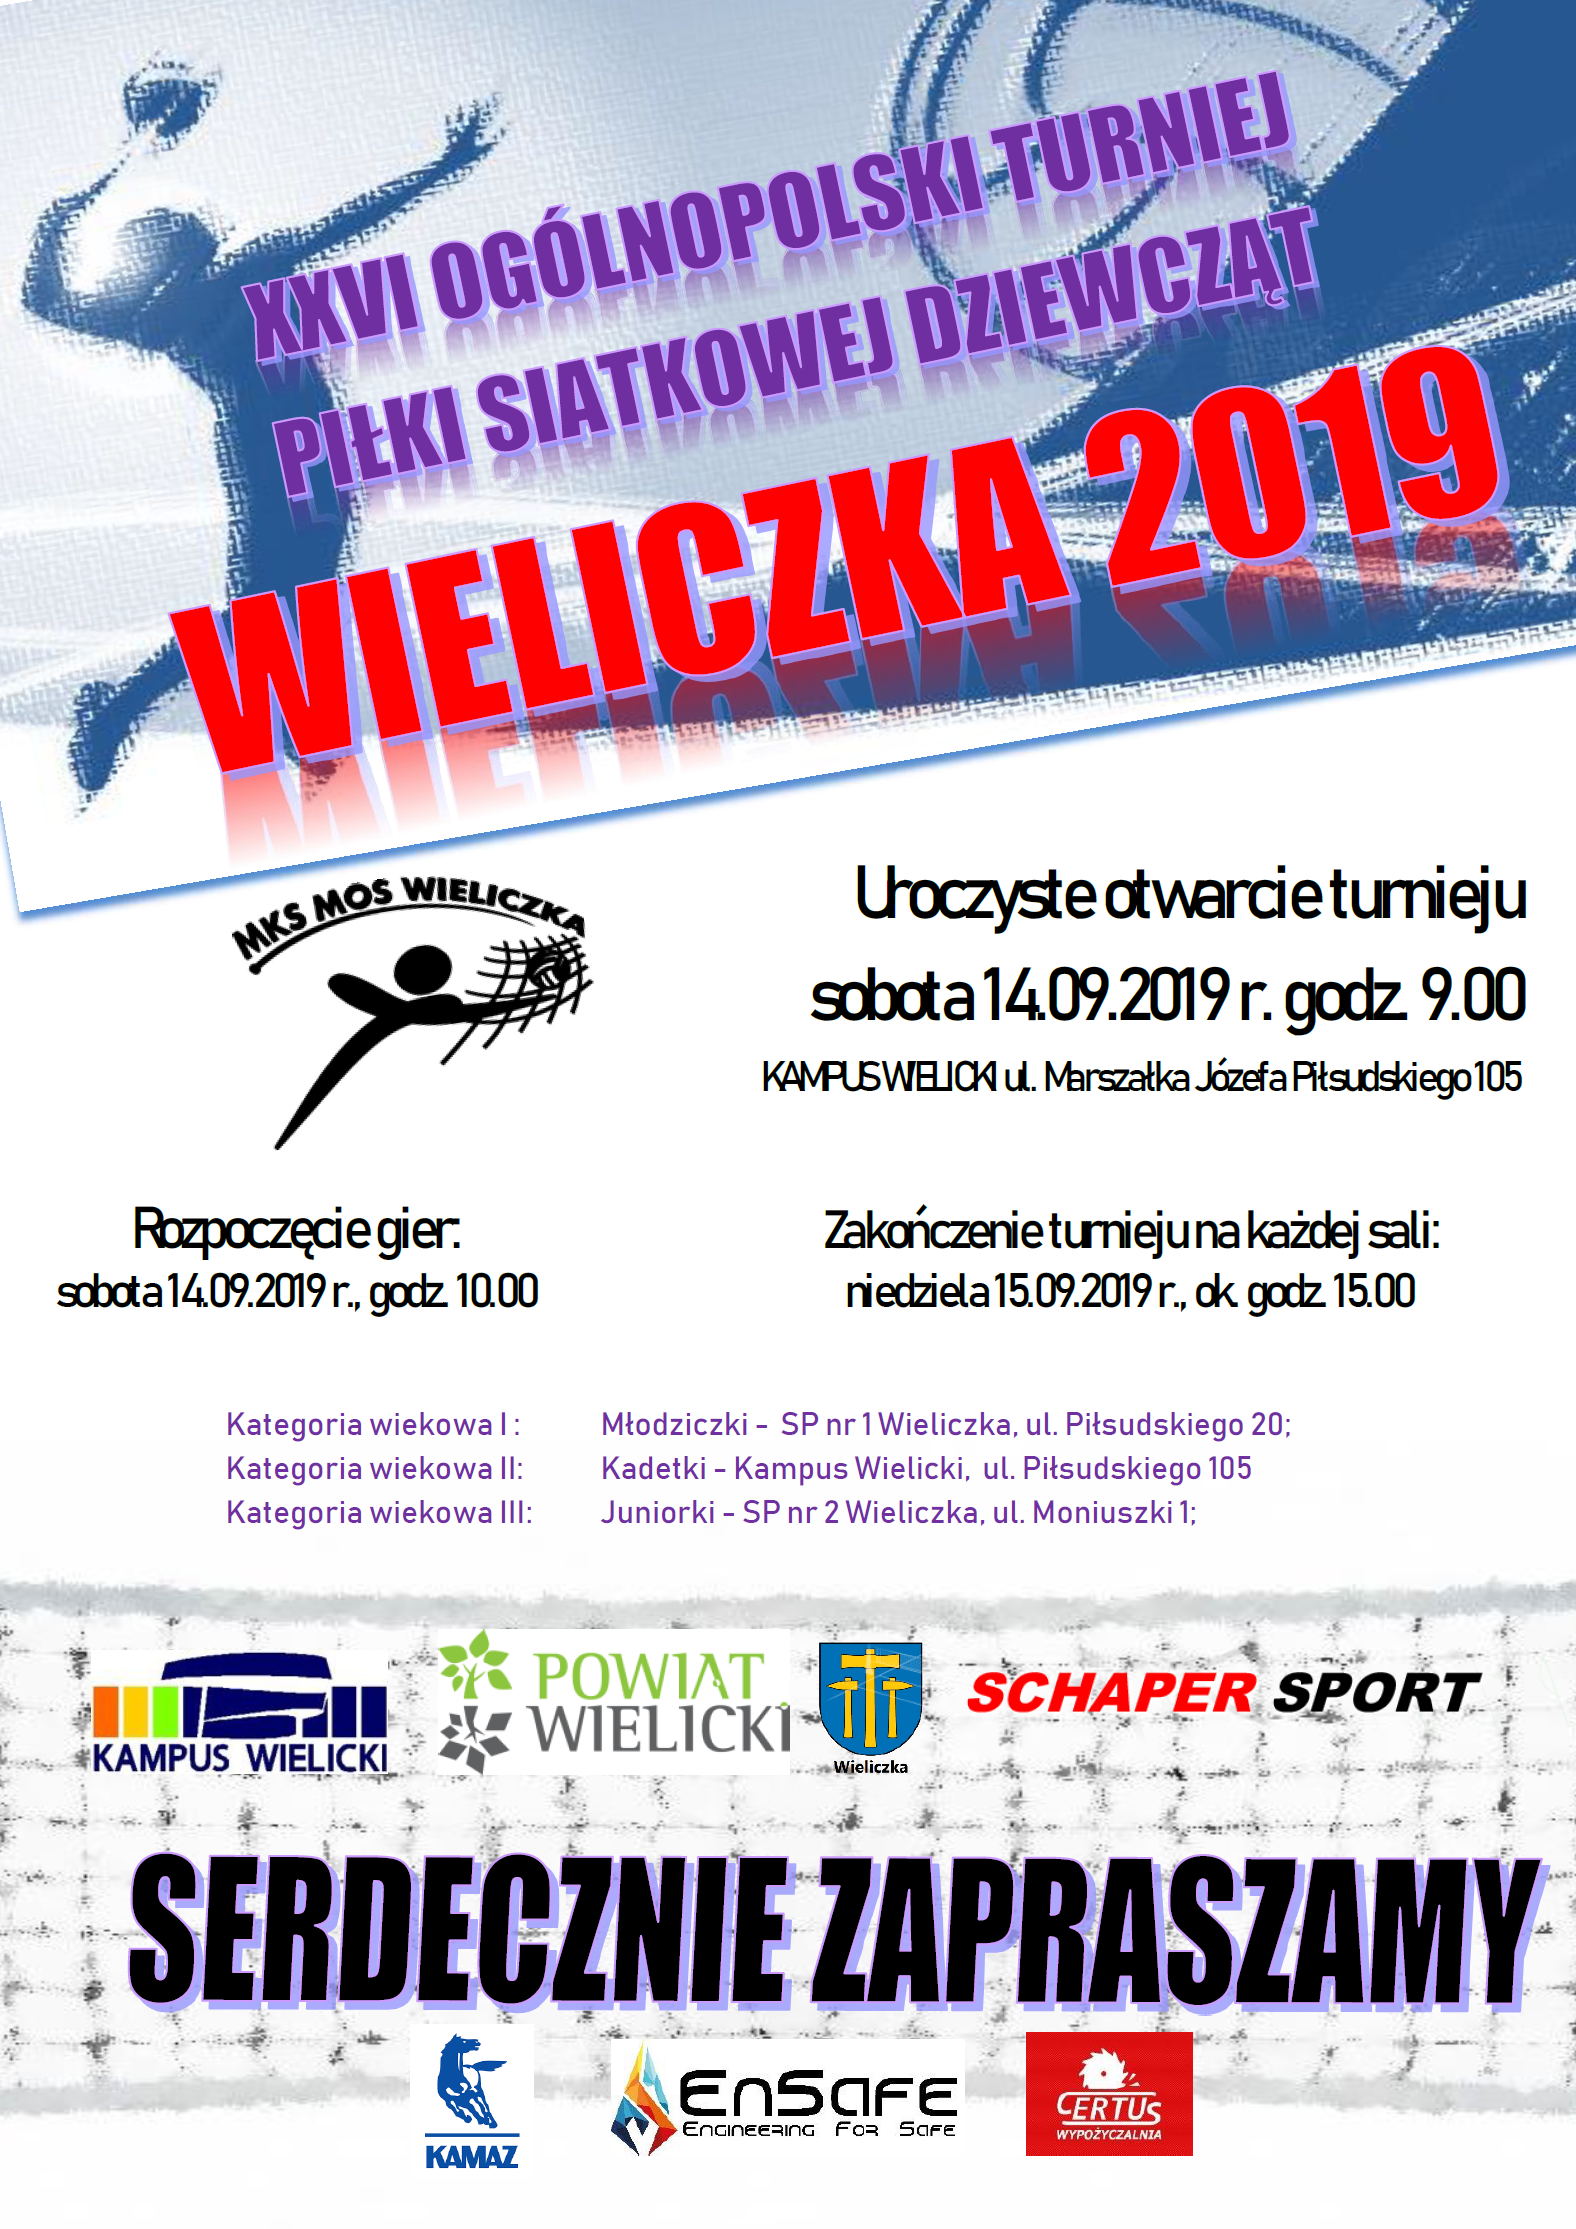 plakat wieliczka 2019